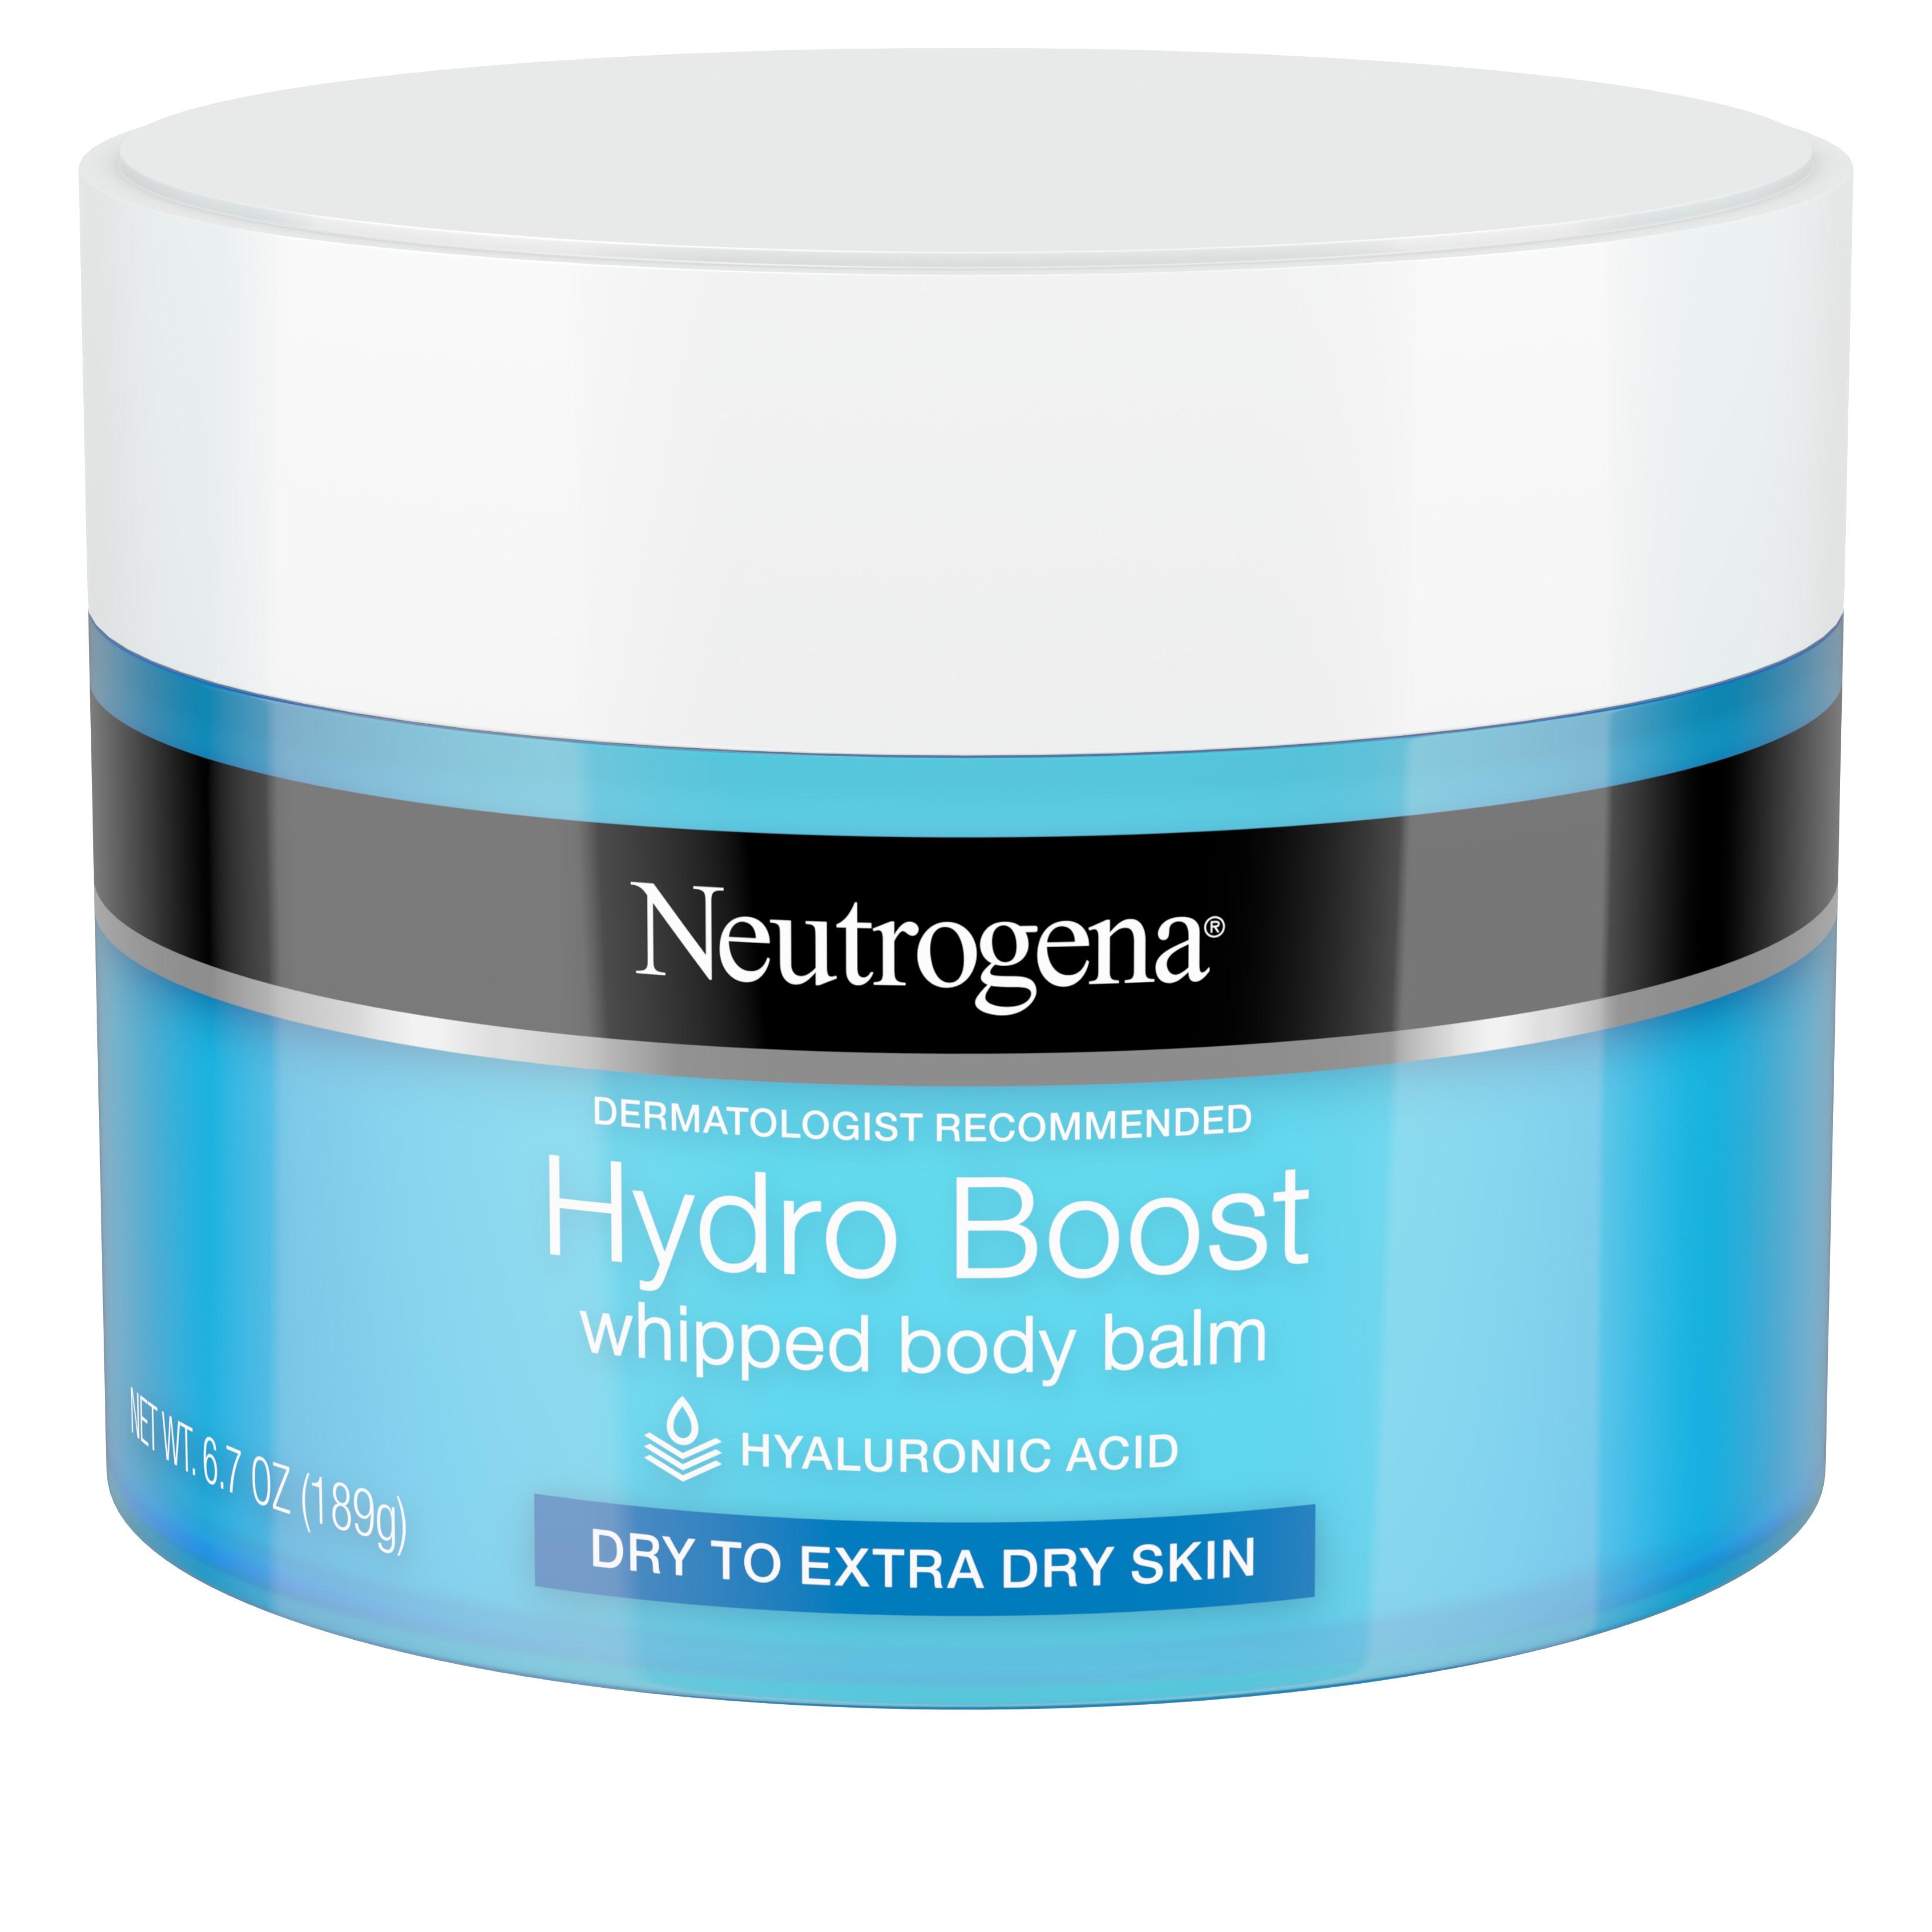 Neutrogena Hydro Boost Hydrating Balm (Pack of 2)